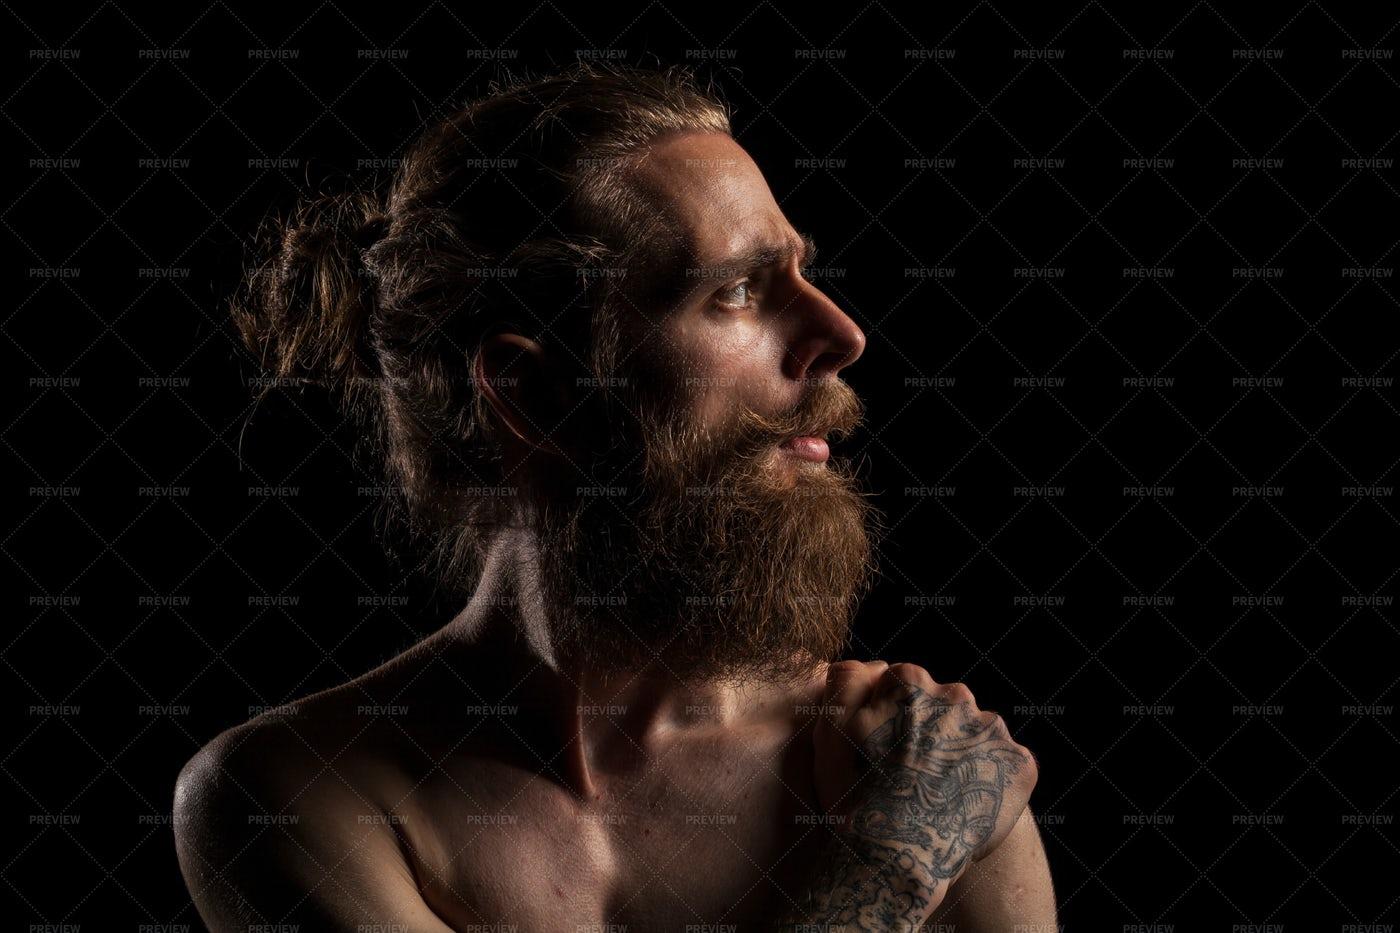 Hipster With A Man Bun: Stock Photos